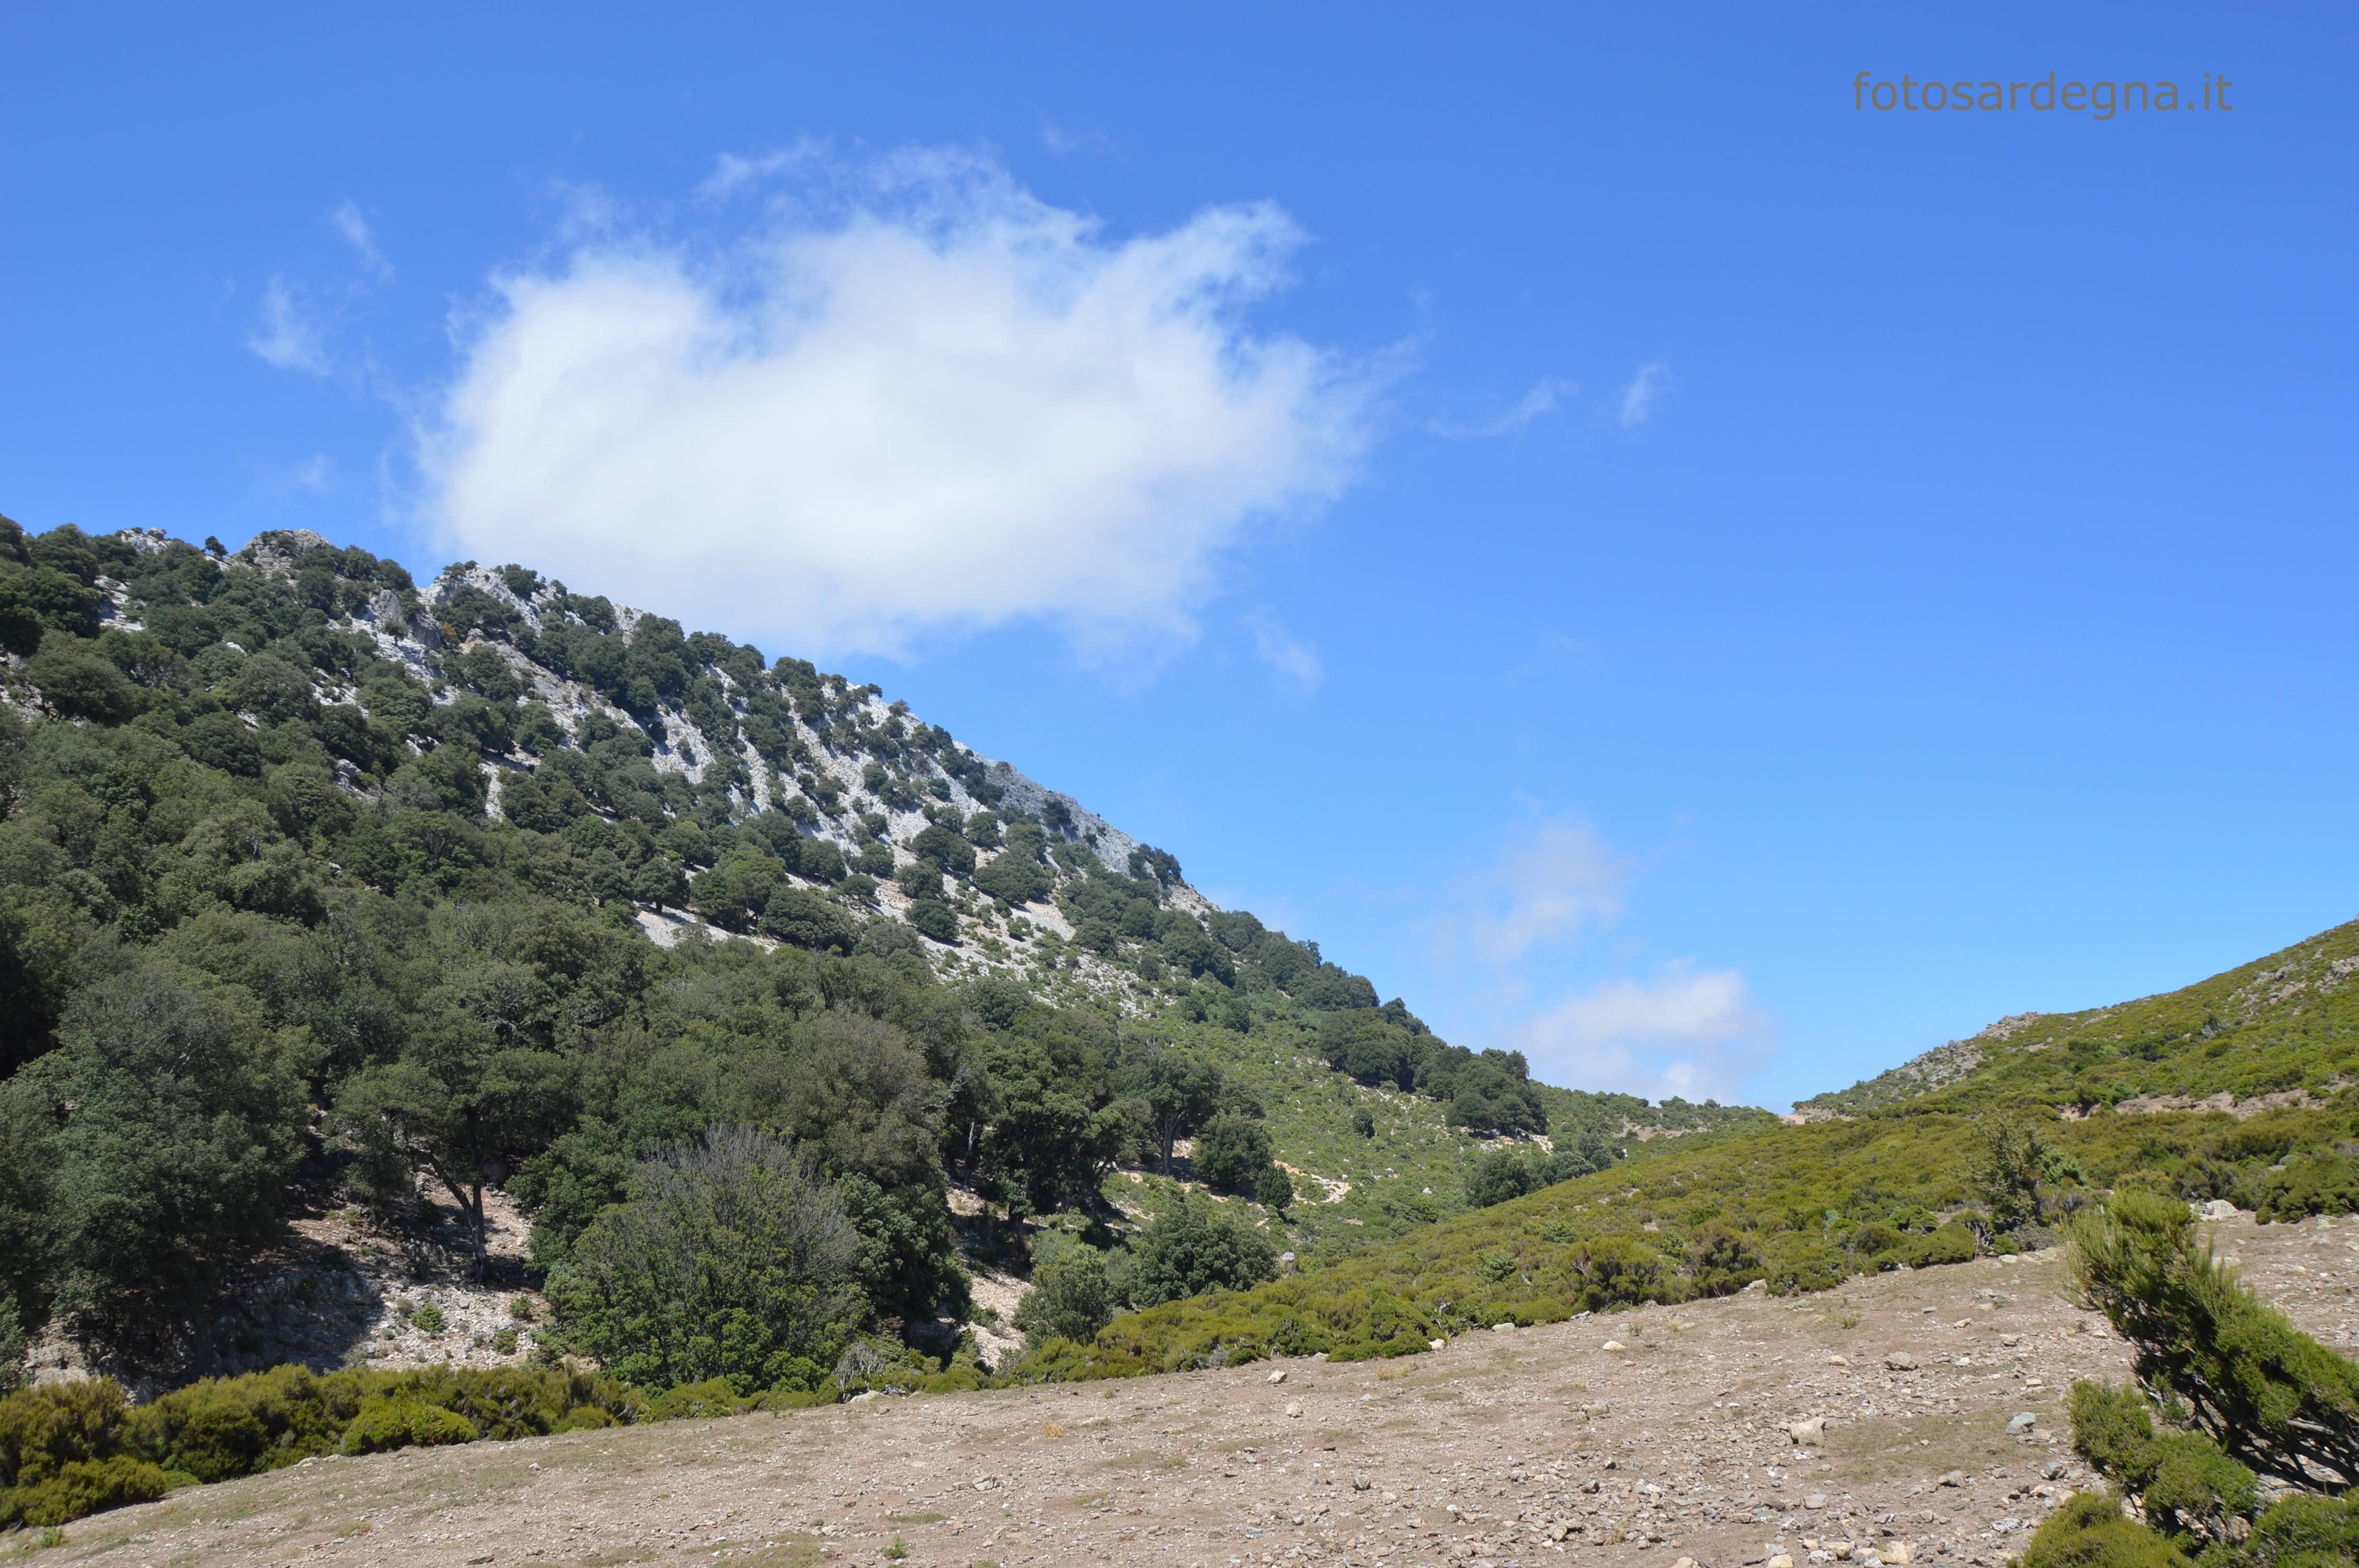 Punta Ispignadorgiu e sulla dx Genna Adaletzo.